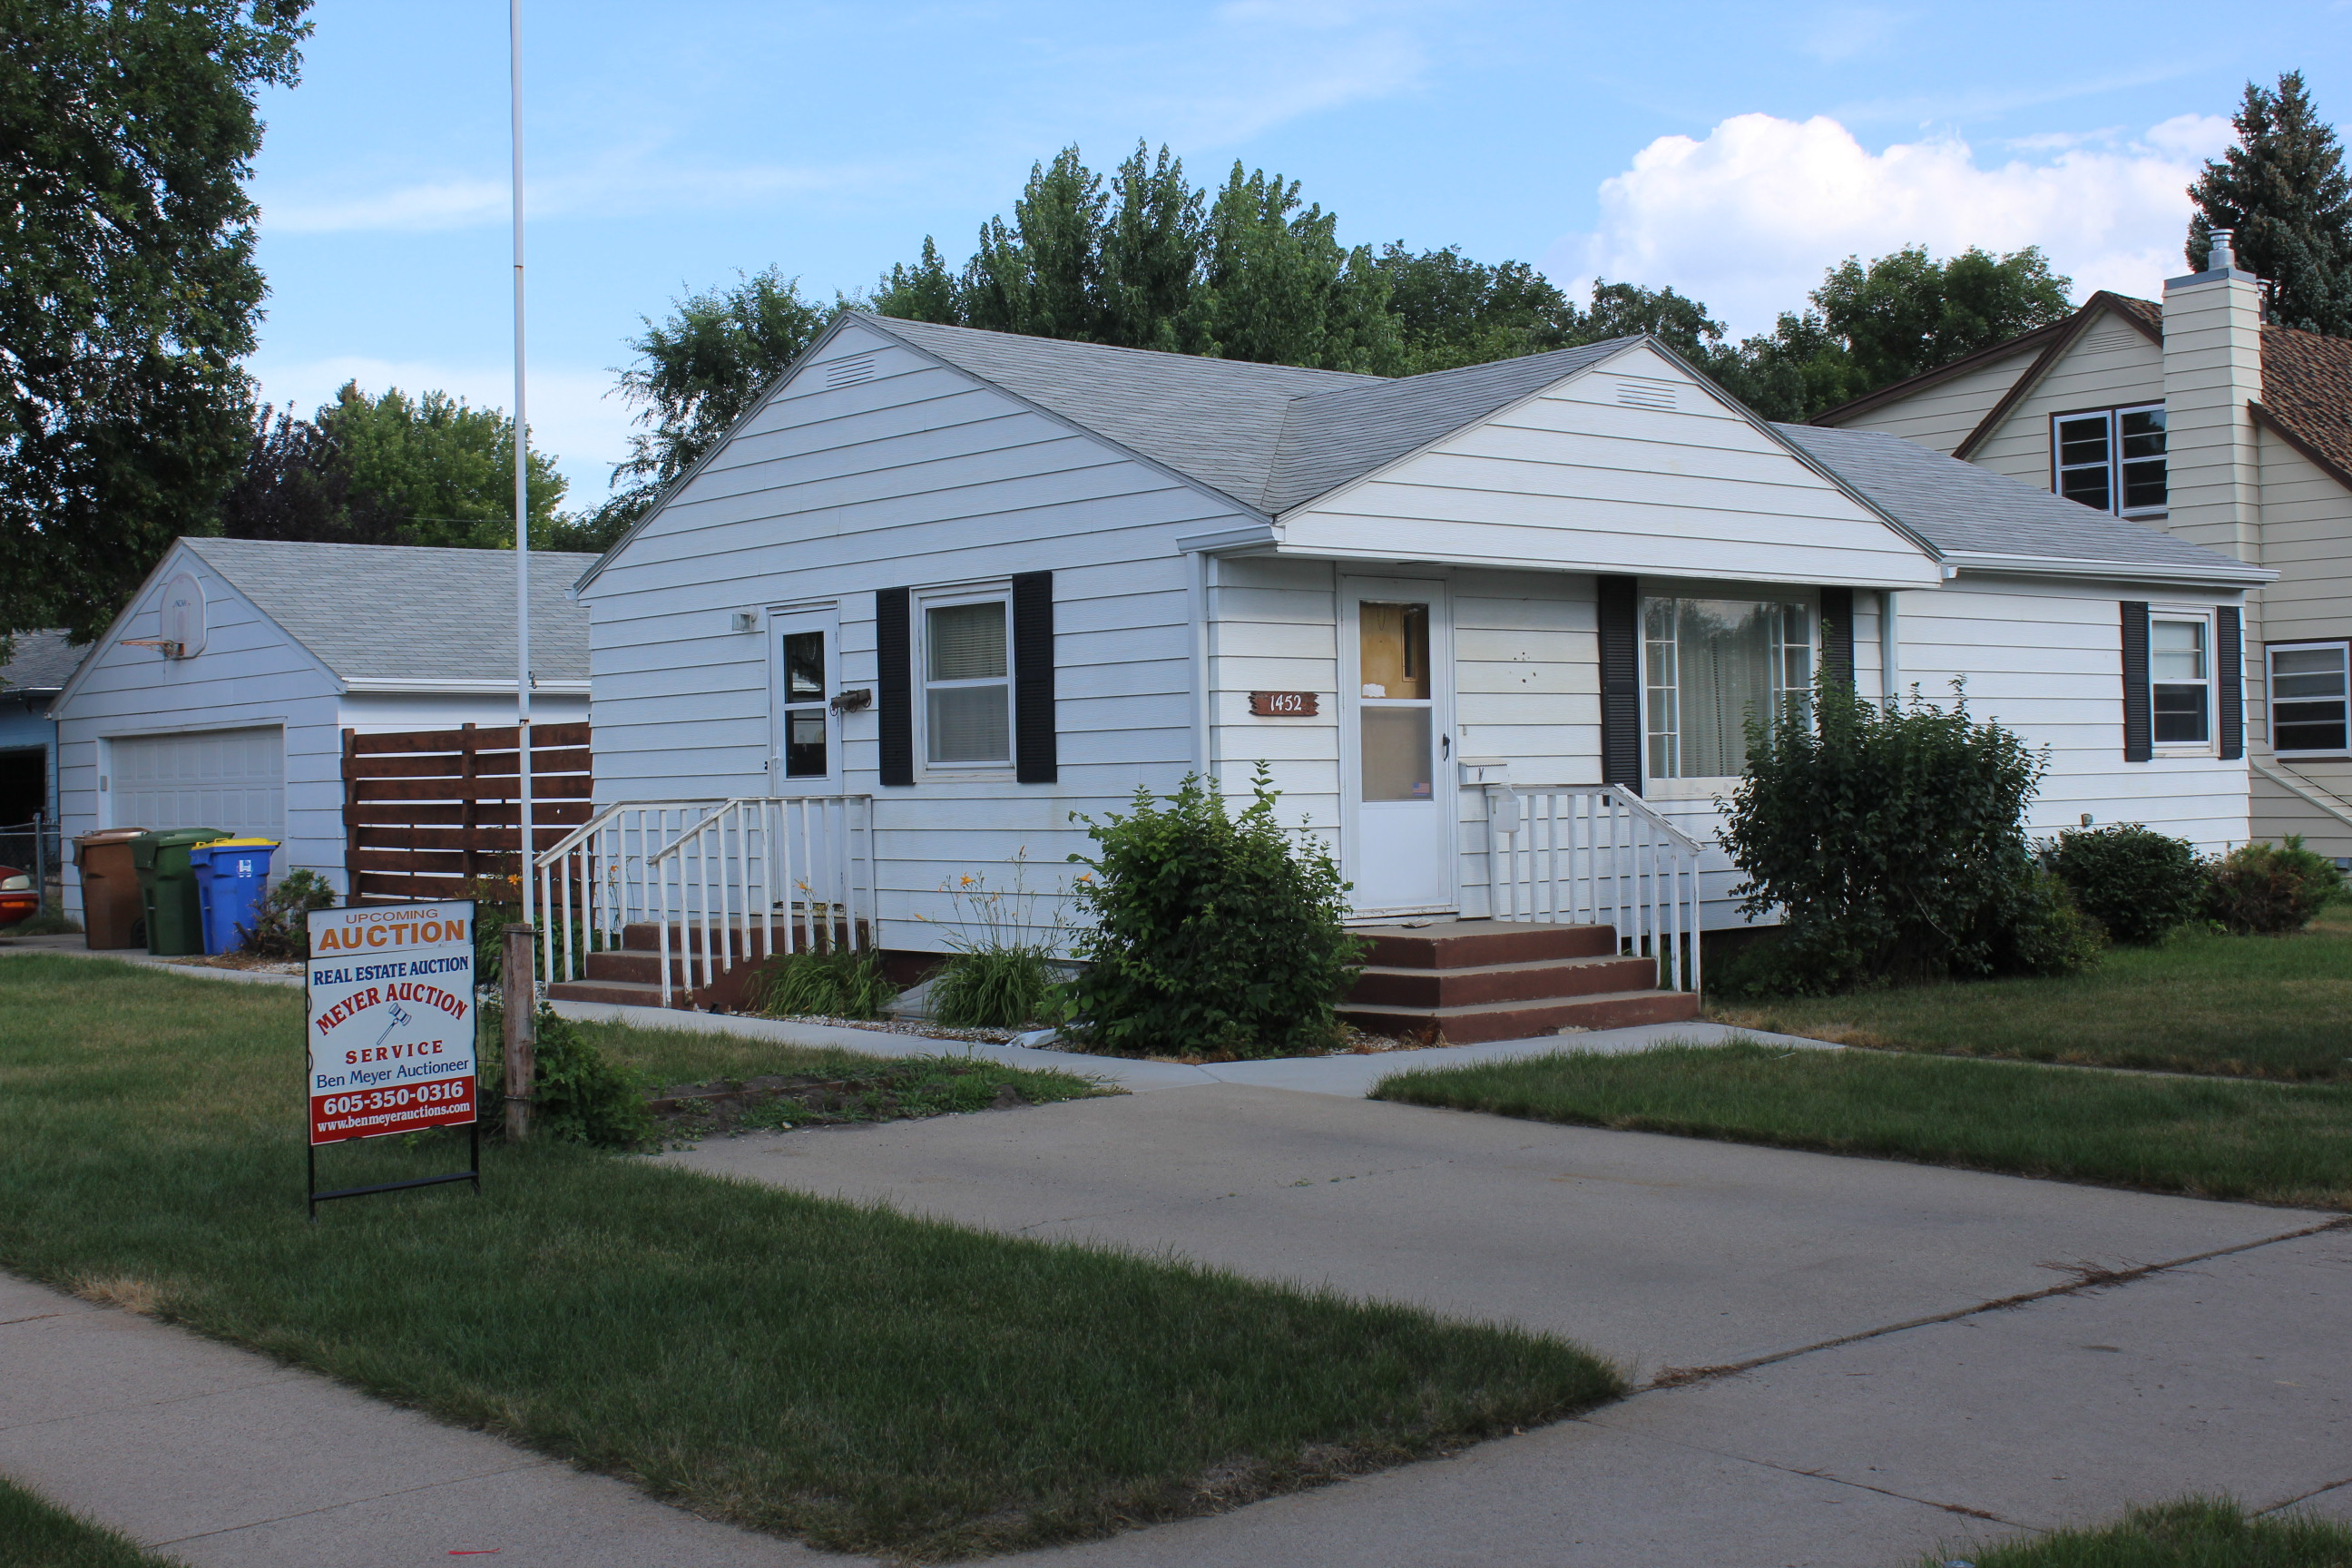 Sep. 12th 6pm ~ House Auction 1452 Utah Ave SE, Huron, SD